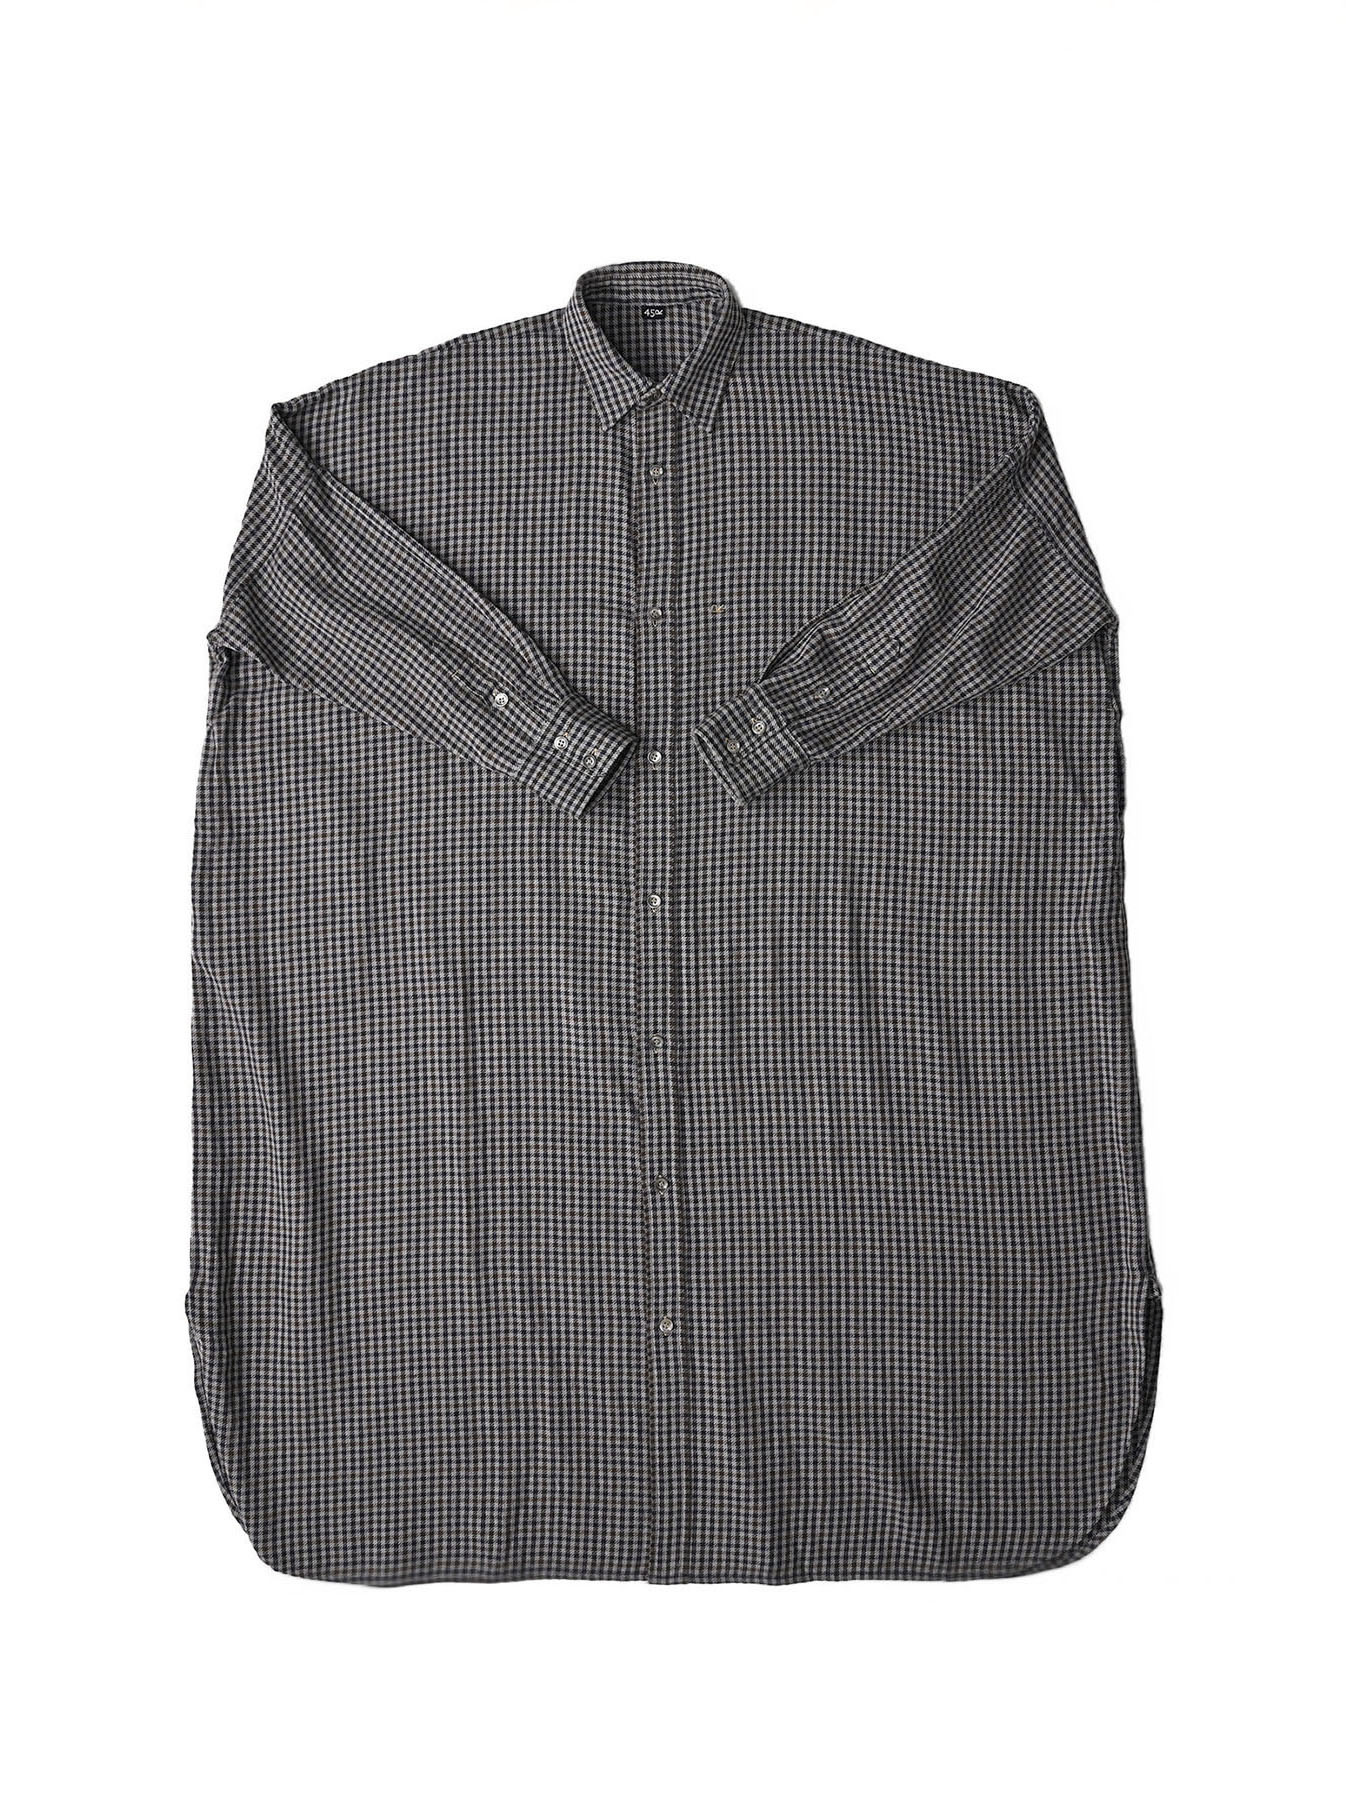 Indian Flannel Big Shirt Dress-5